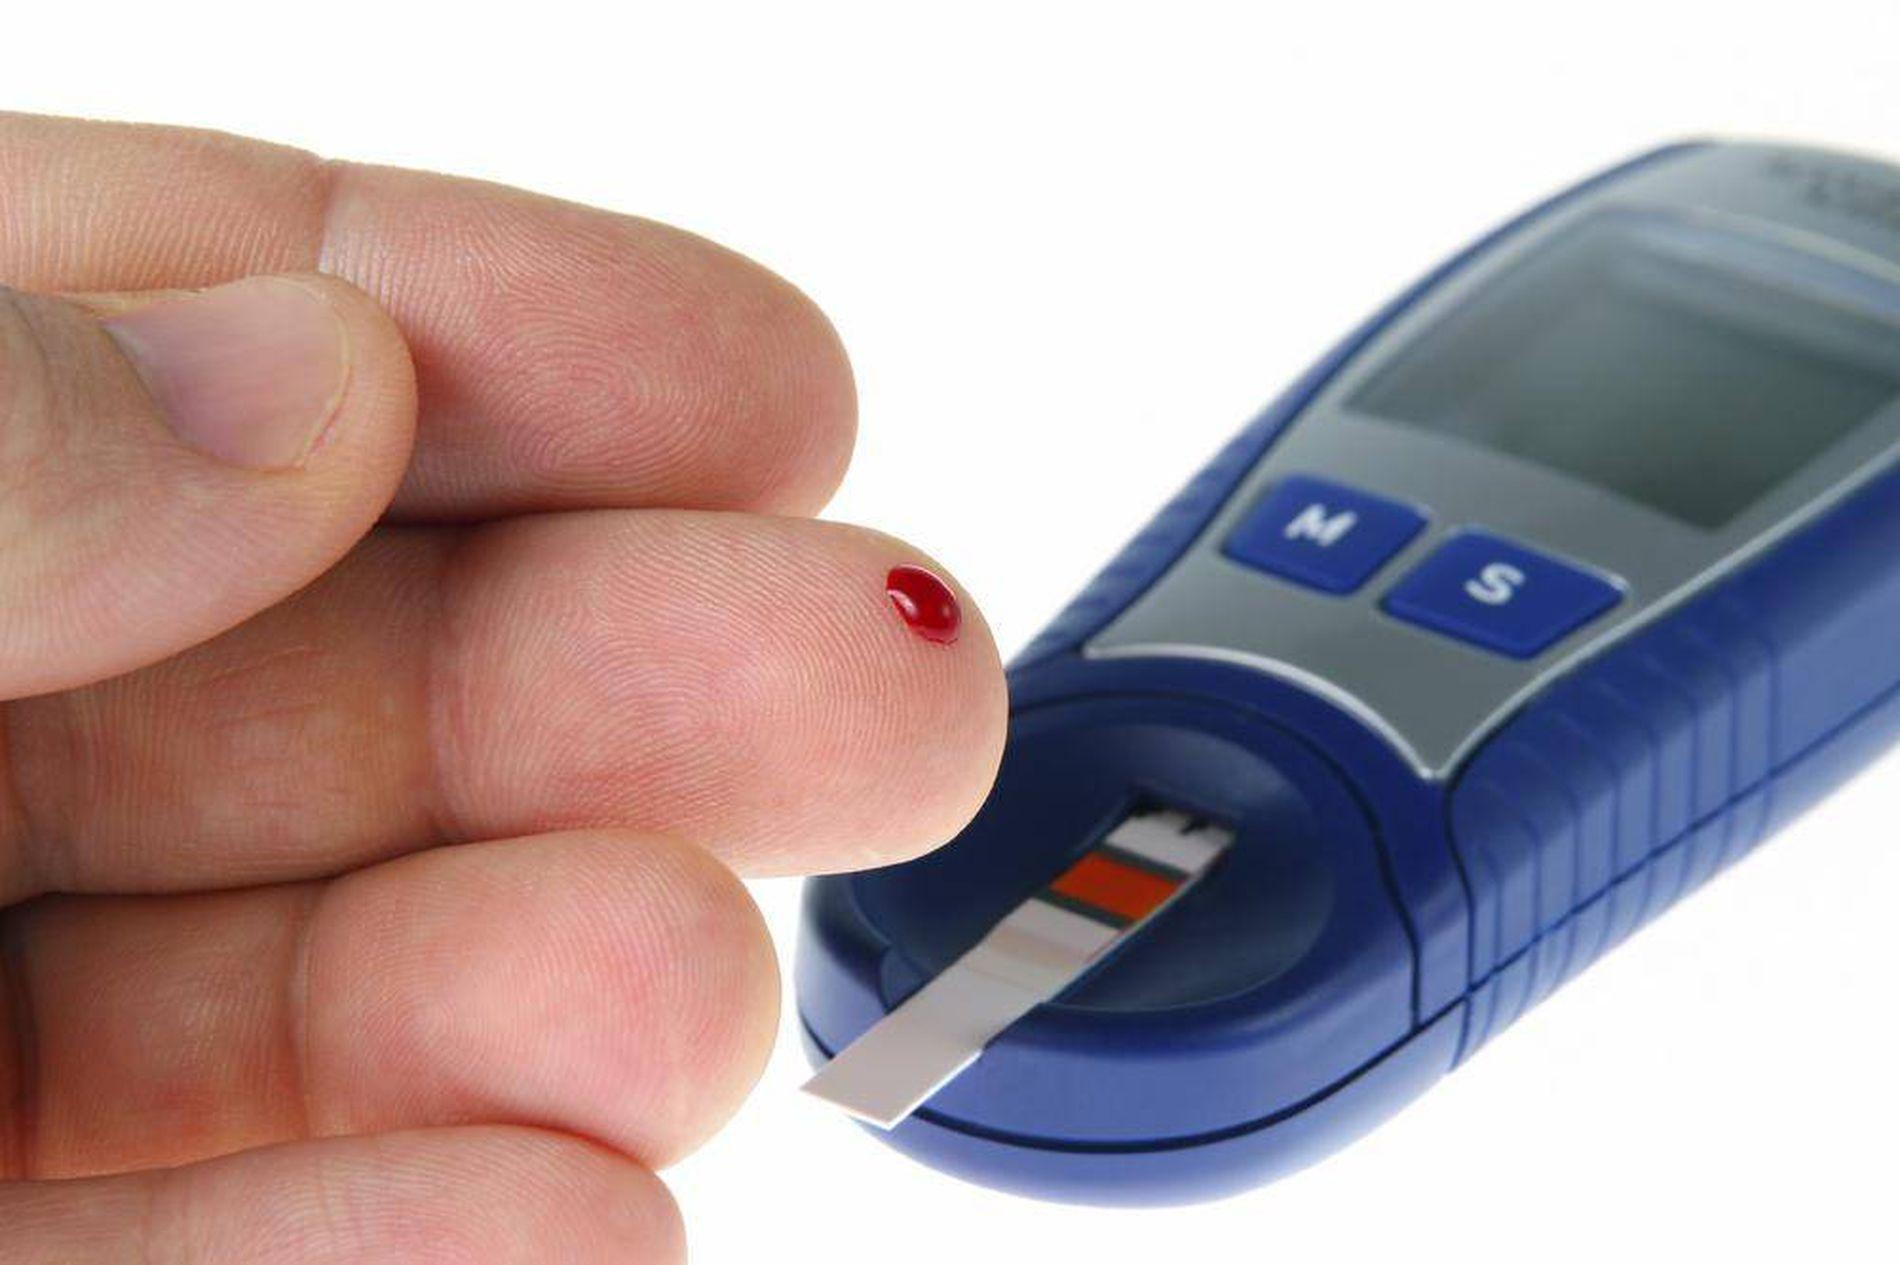 Mortality Rates Plummet Among Diabetes Sufferers